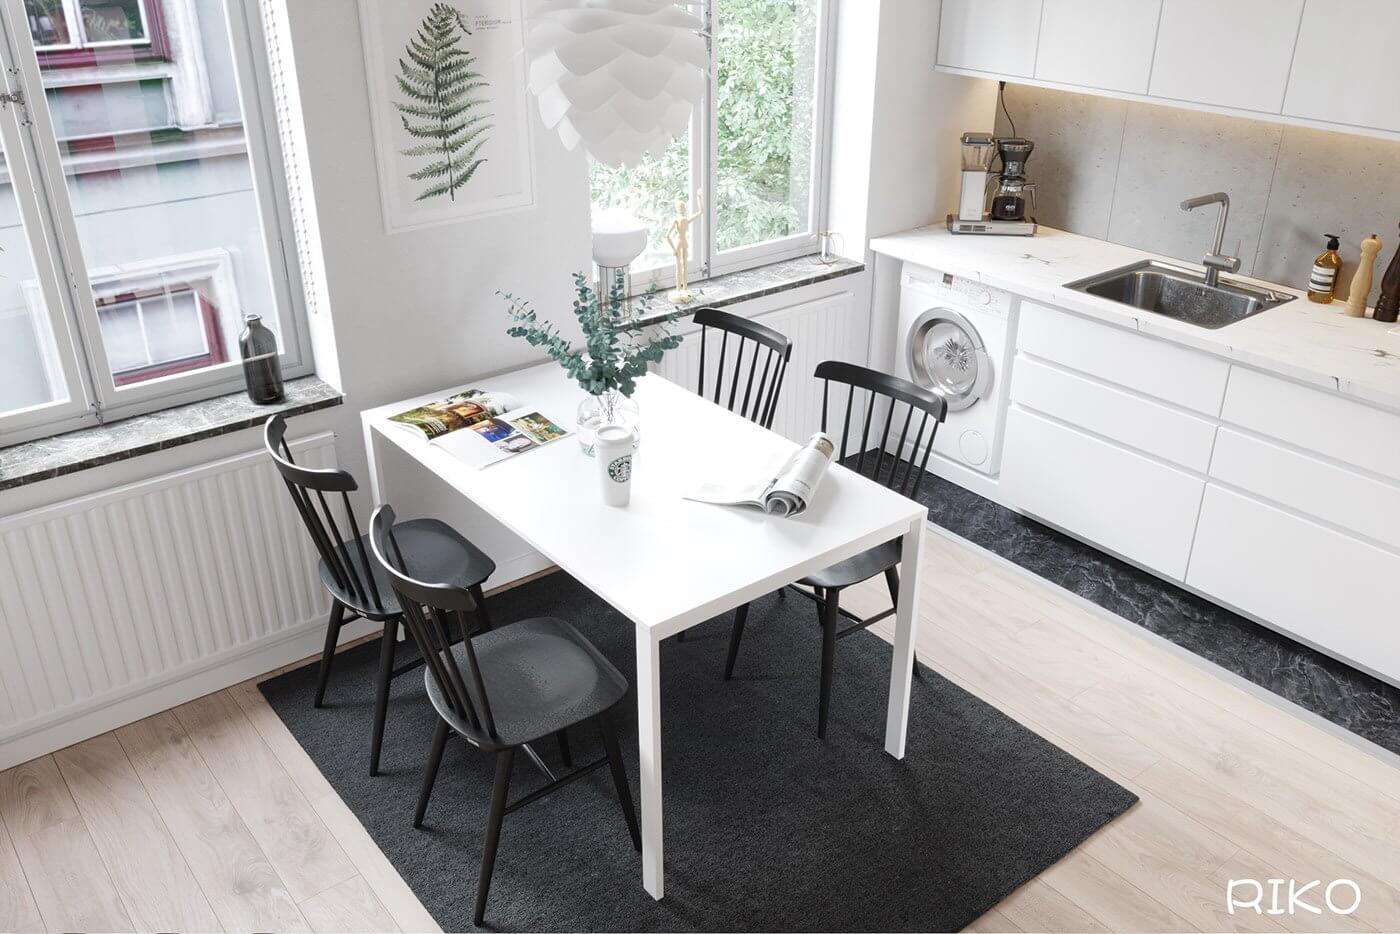 White kitchen design dining table white 3 - cgi visualization